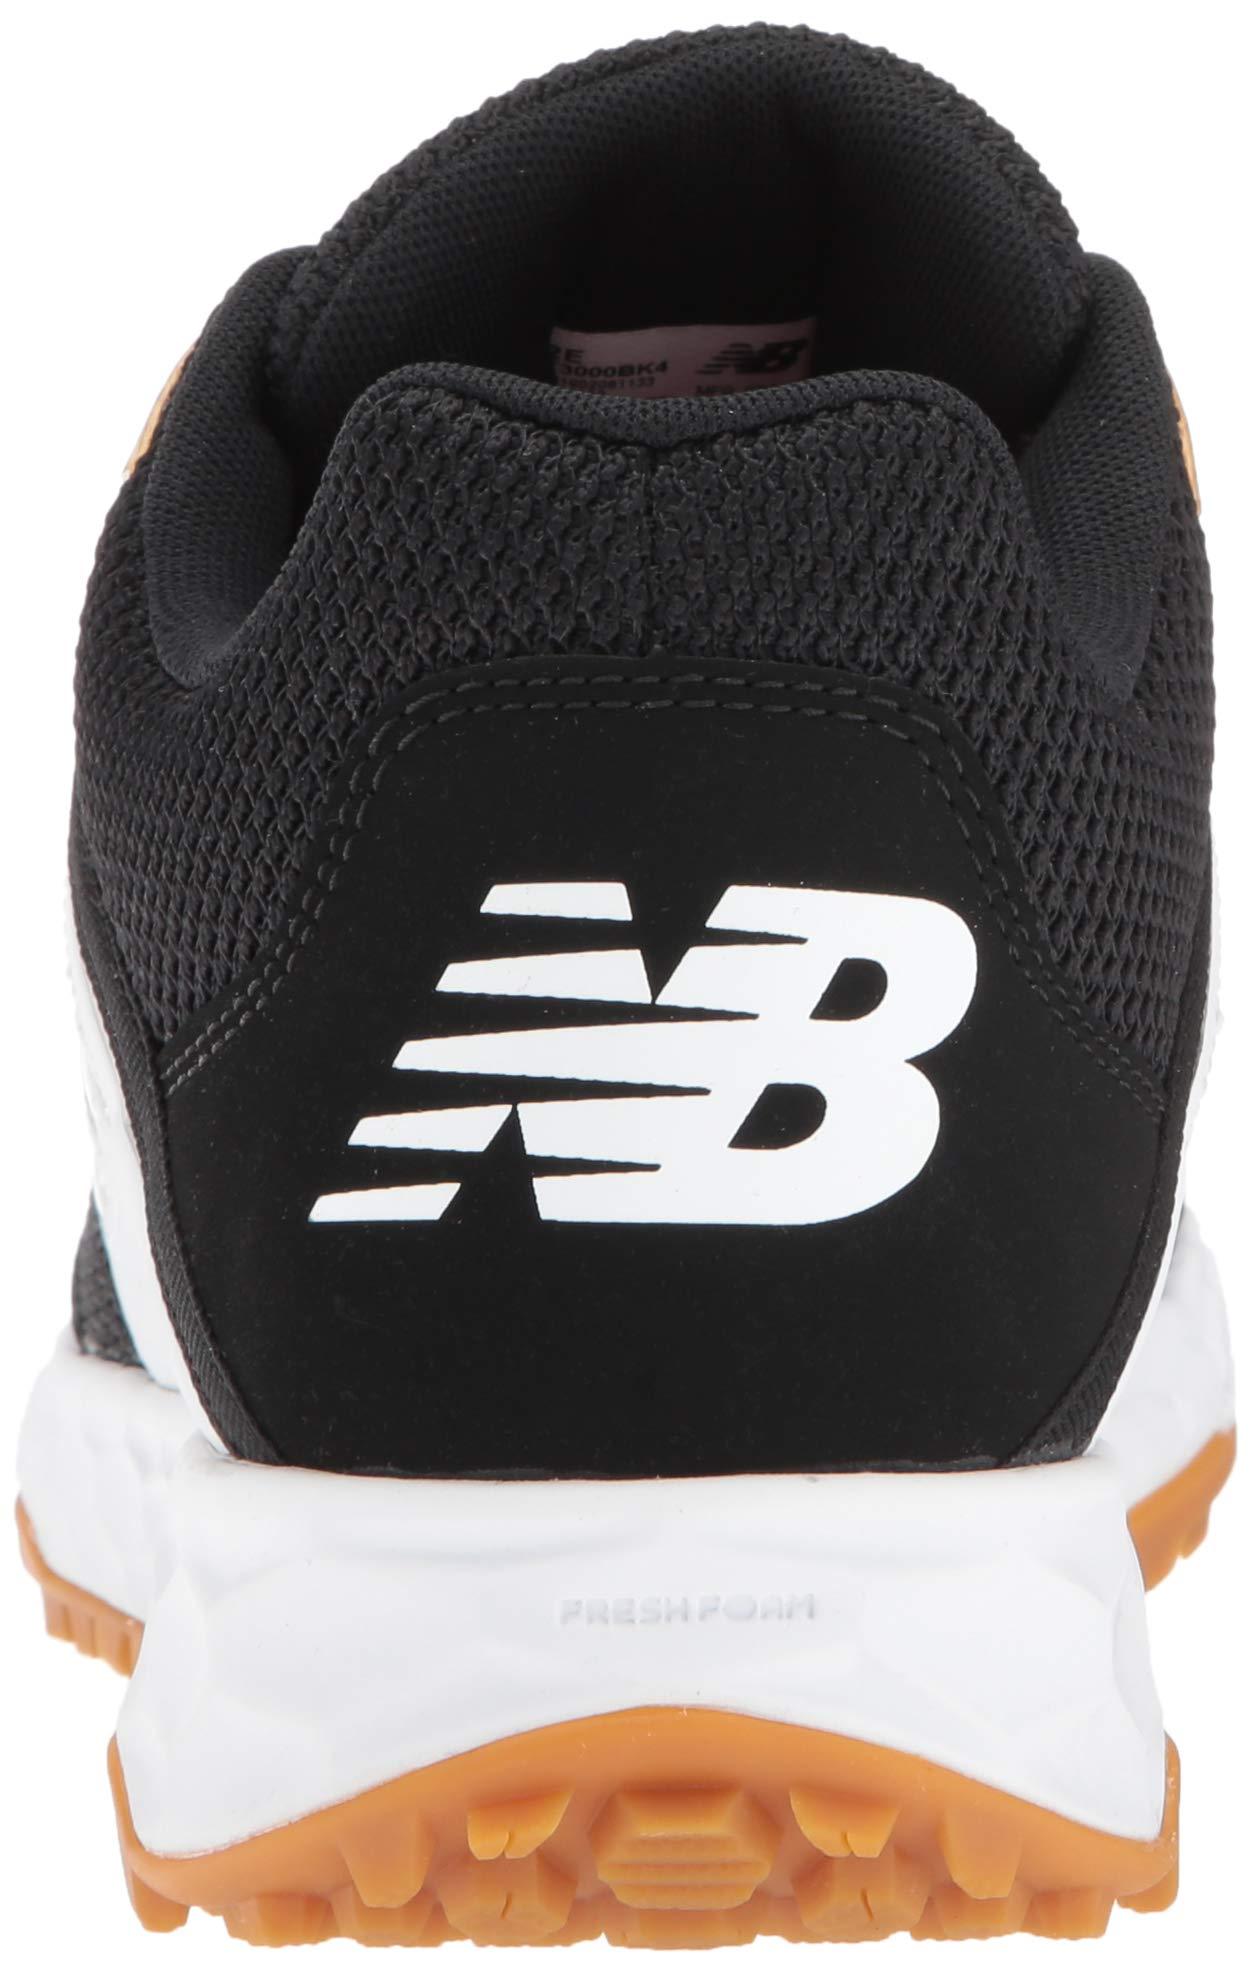 New Balance Men's 3000v4 Turf Baseball Shoe, Black/White, 5 D US by New Balance (Image #2)